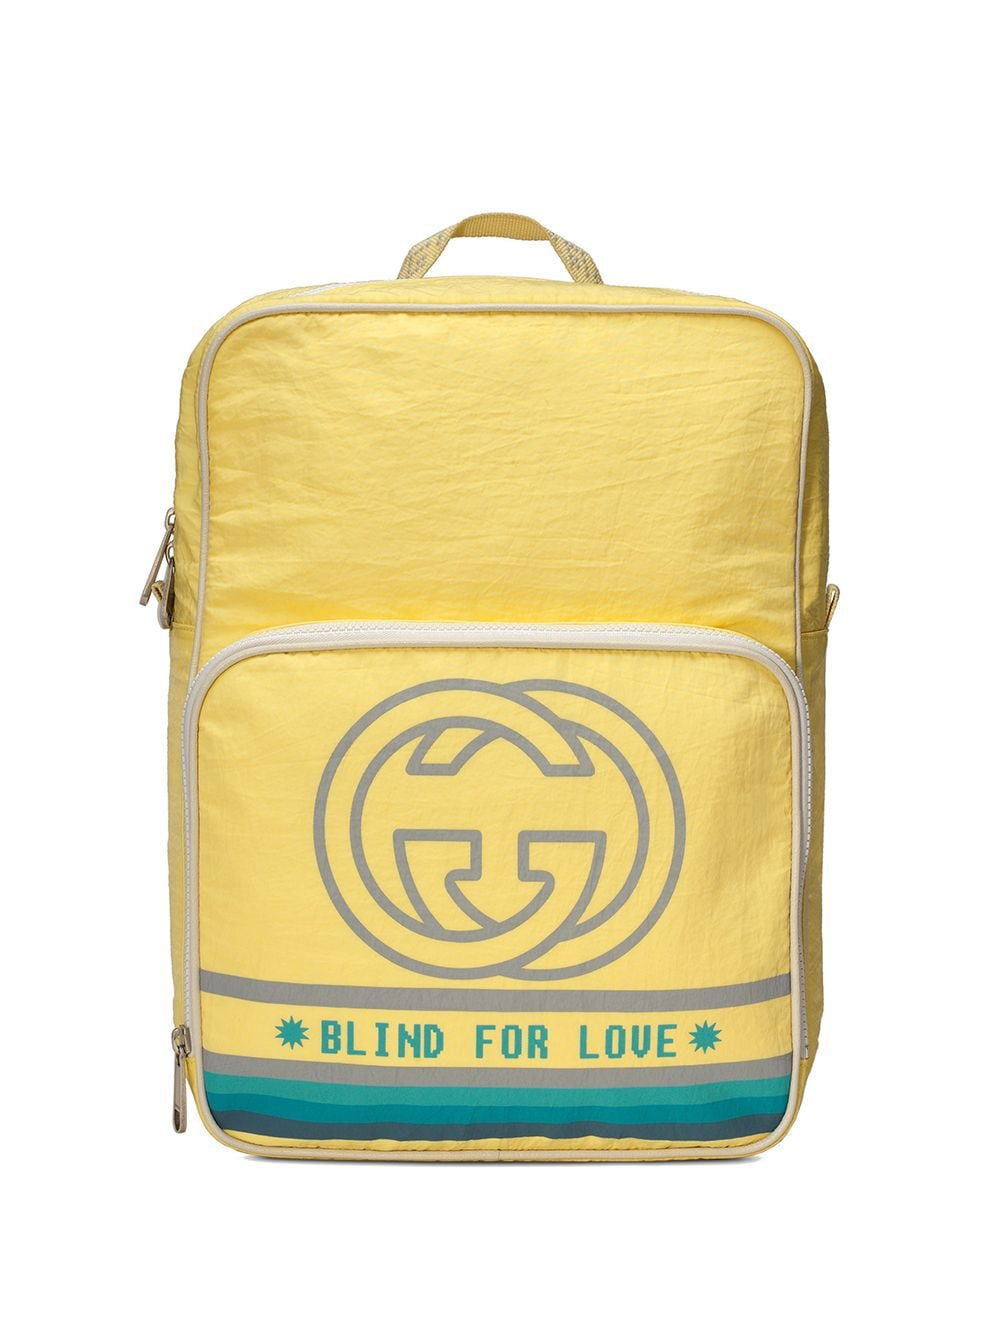 Gucci Medium Backpack With Interlocking G Print | Farfetch.com